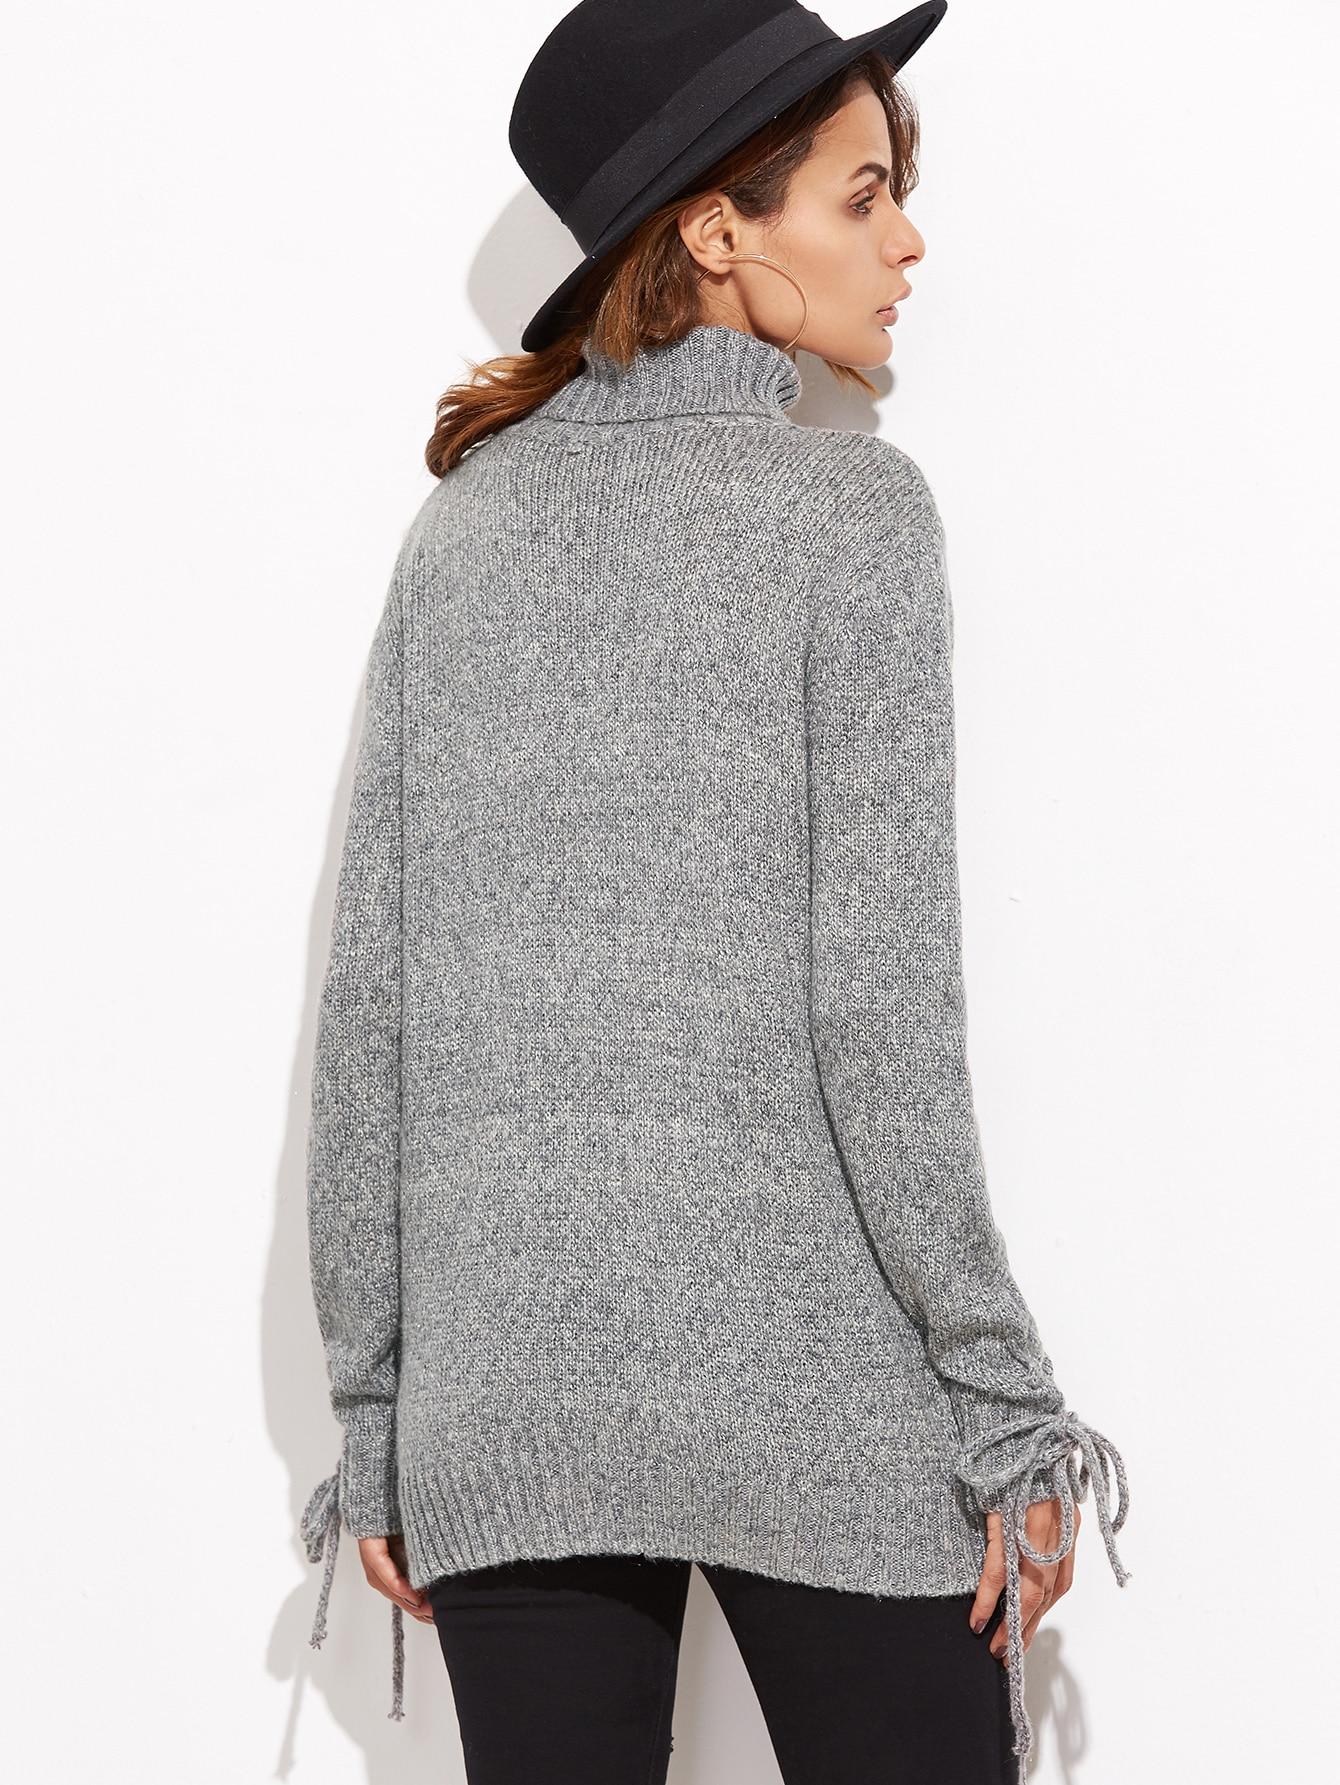 sweater161007467_2